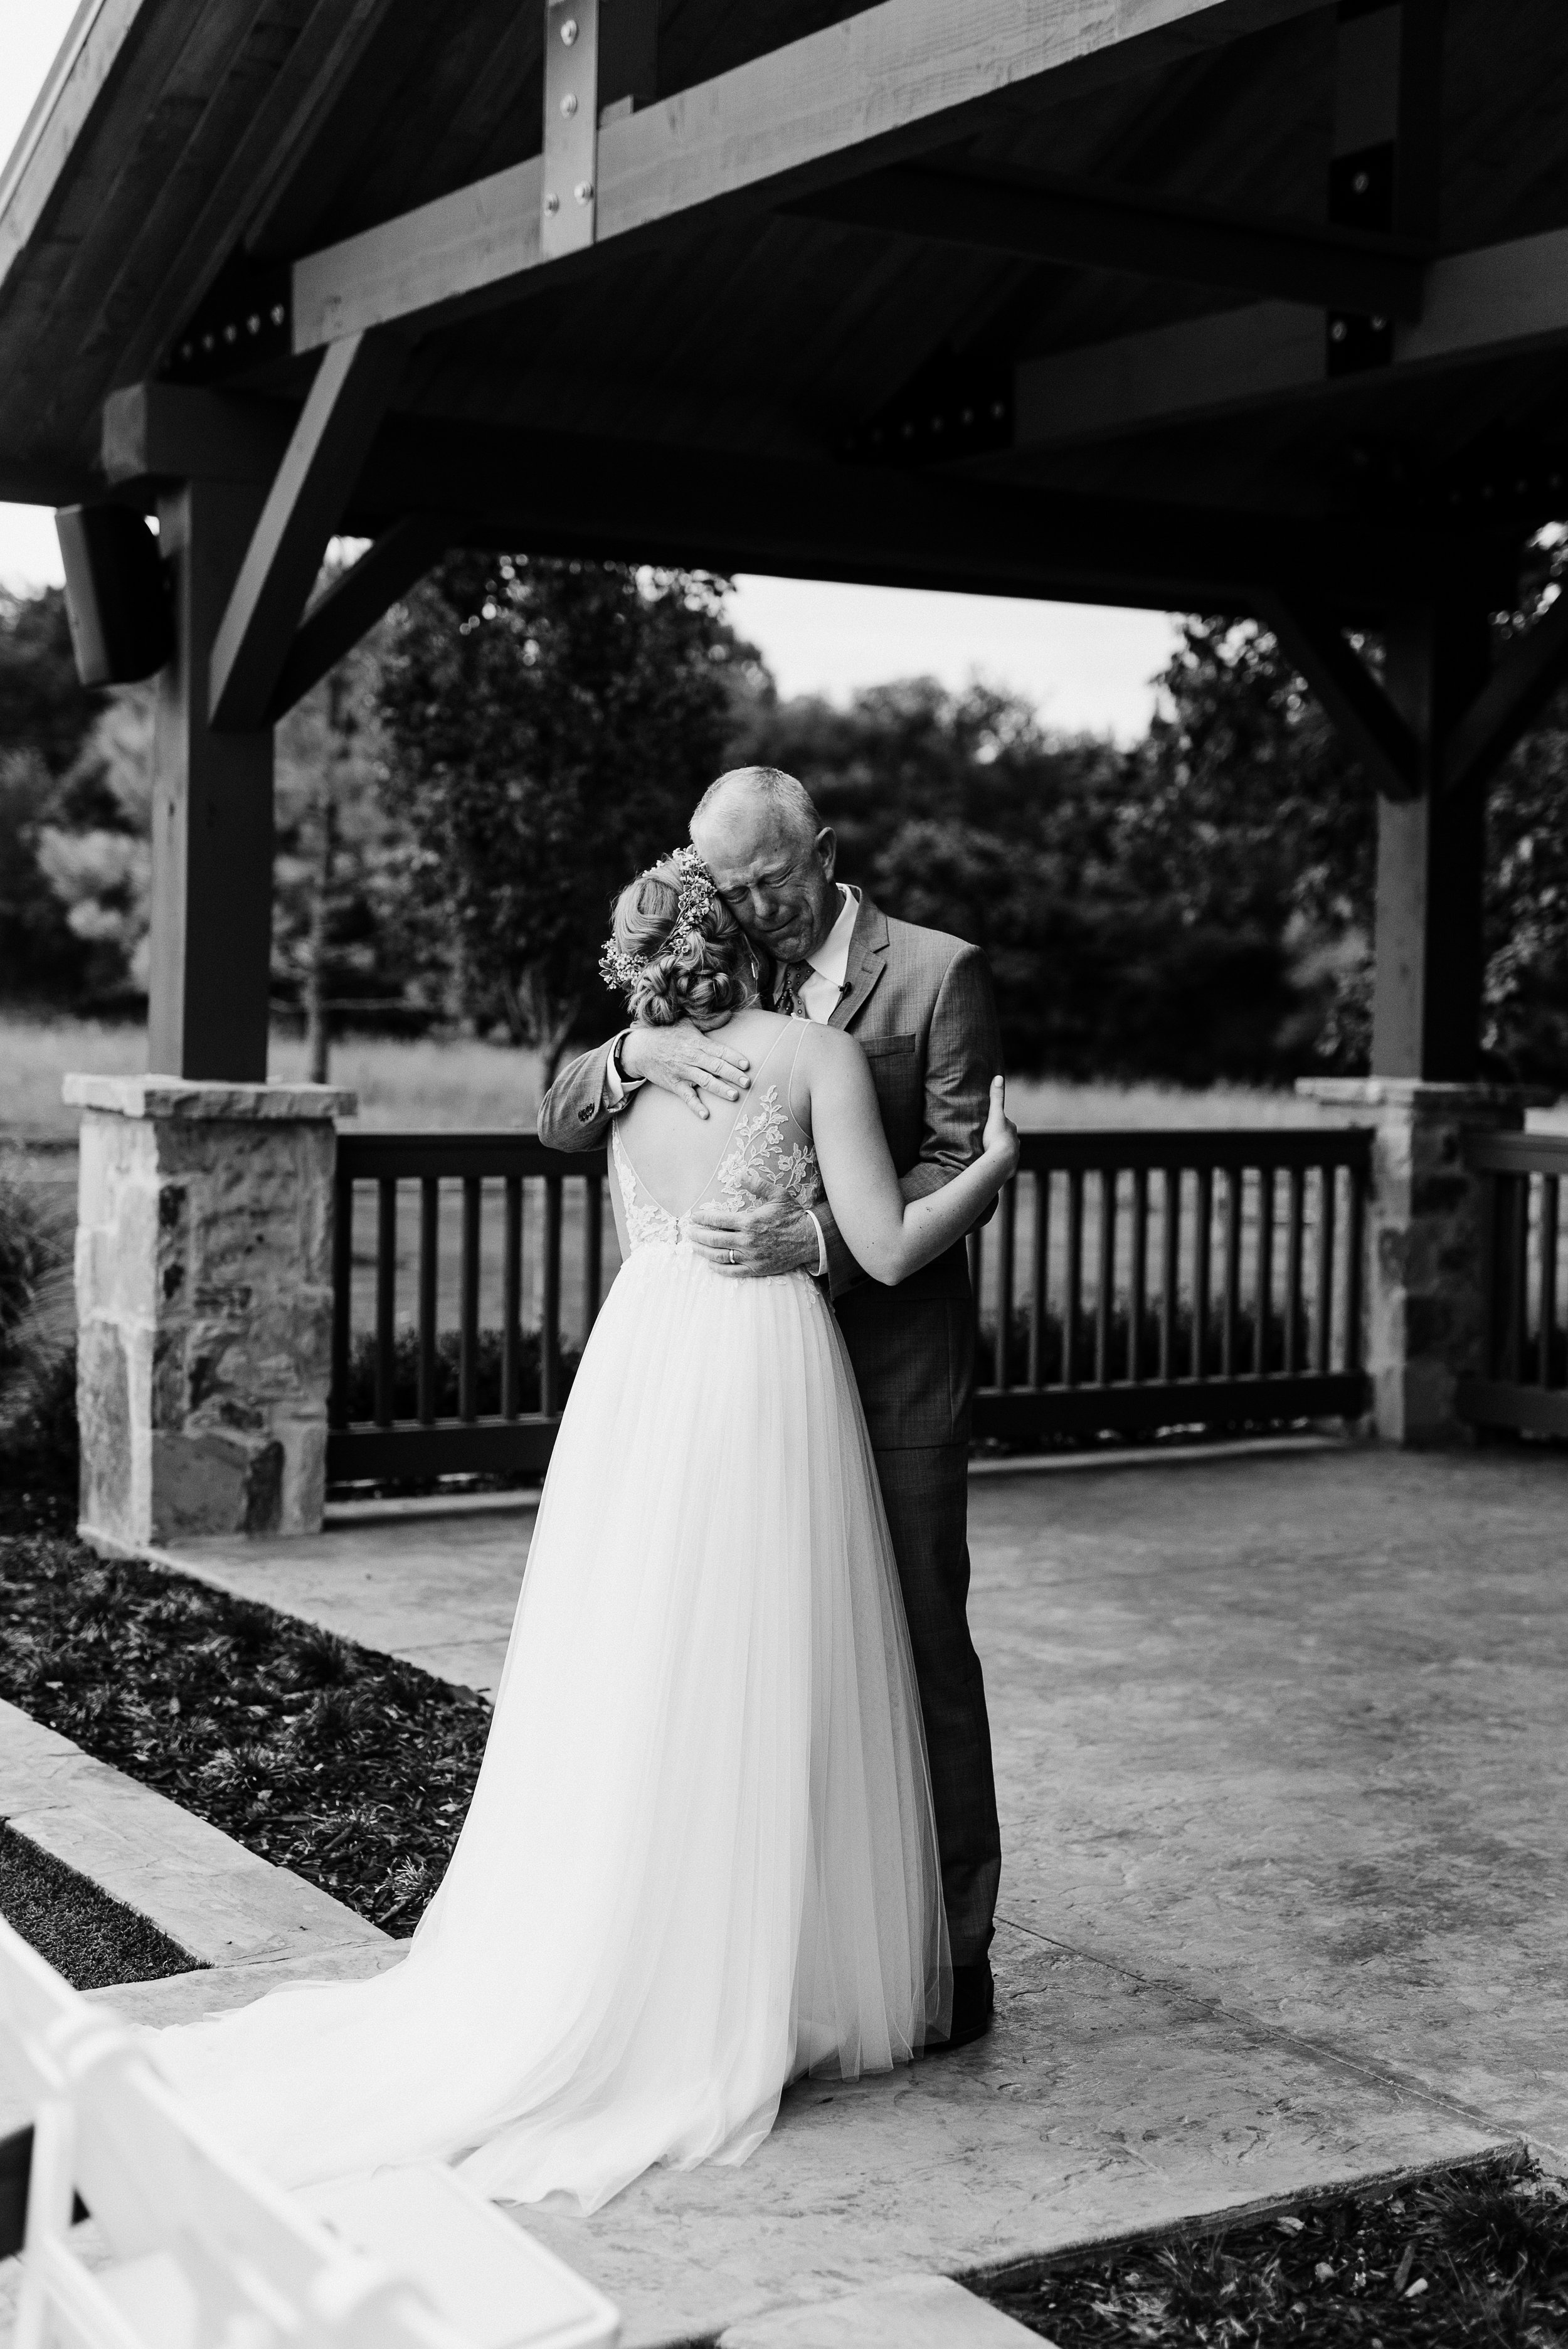 Candid_Wedding_Photographer_Moments